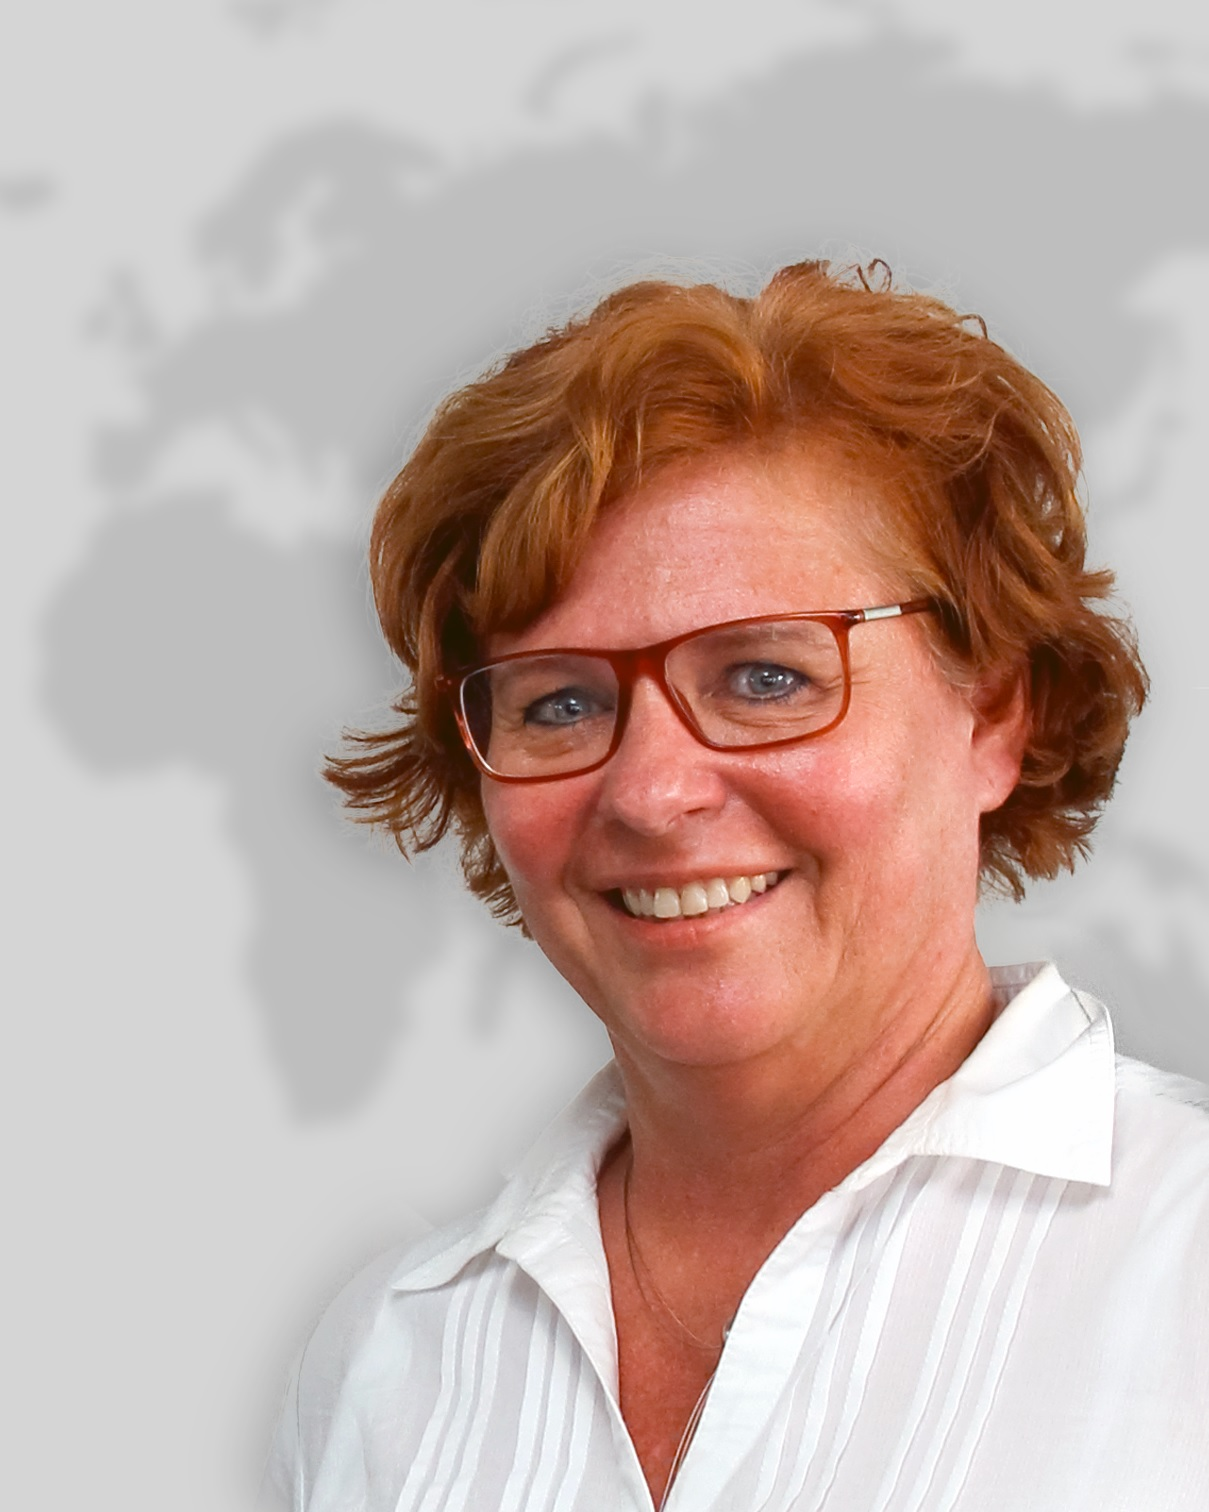 Ann-Christin Witte